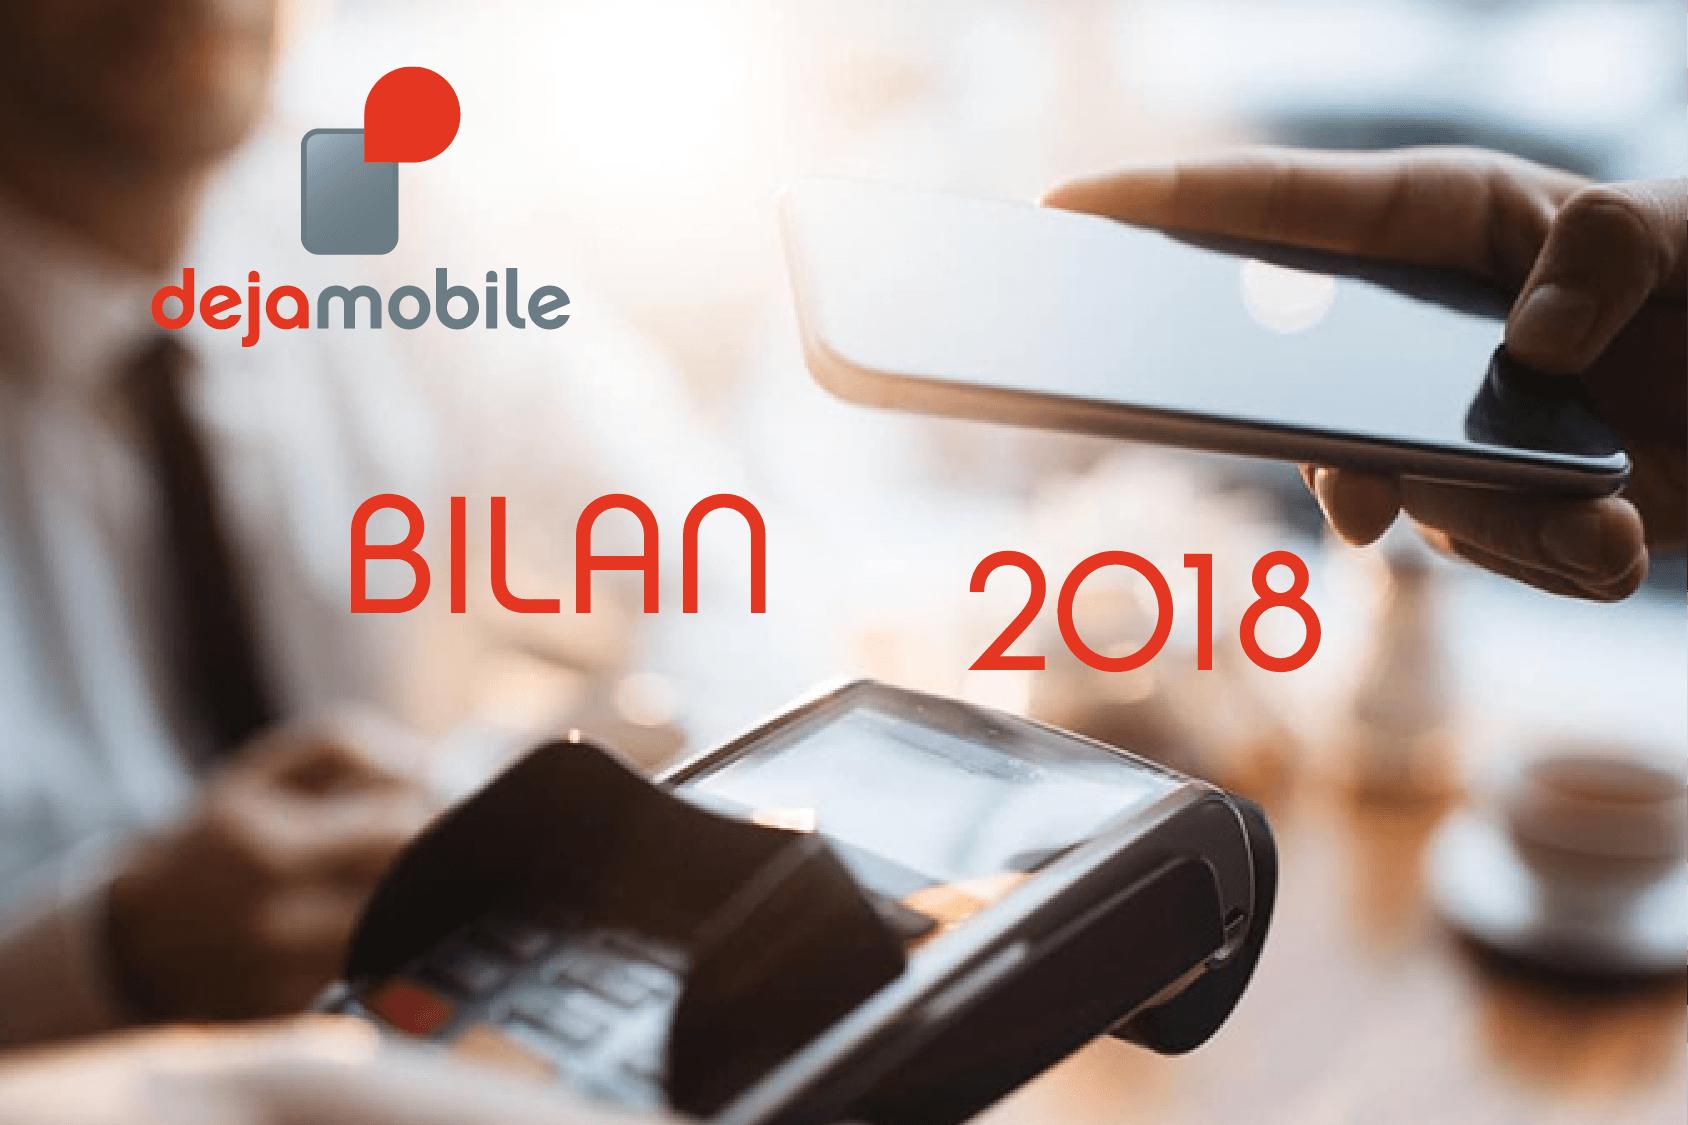 dejamobile-bilan-année-2018